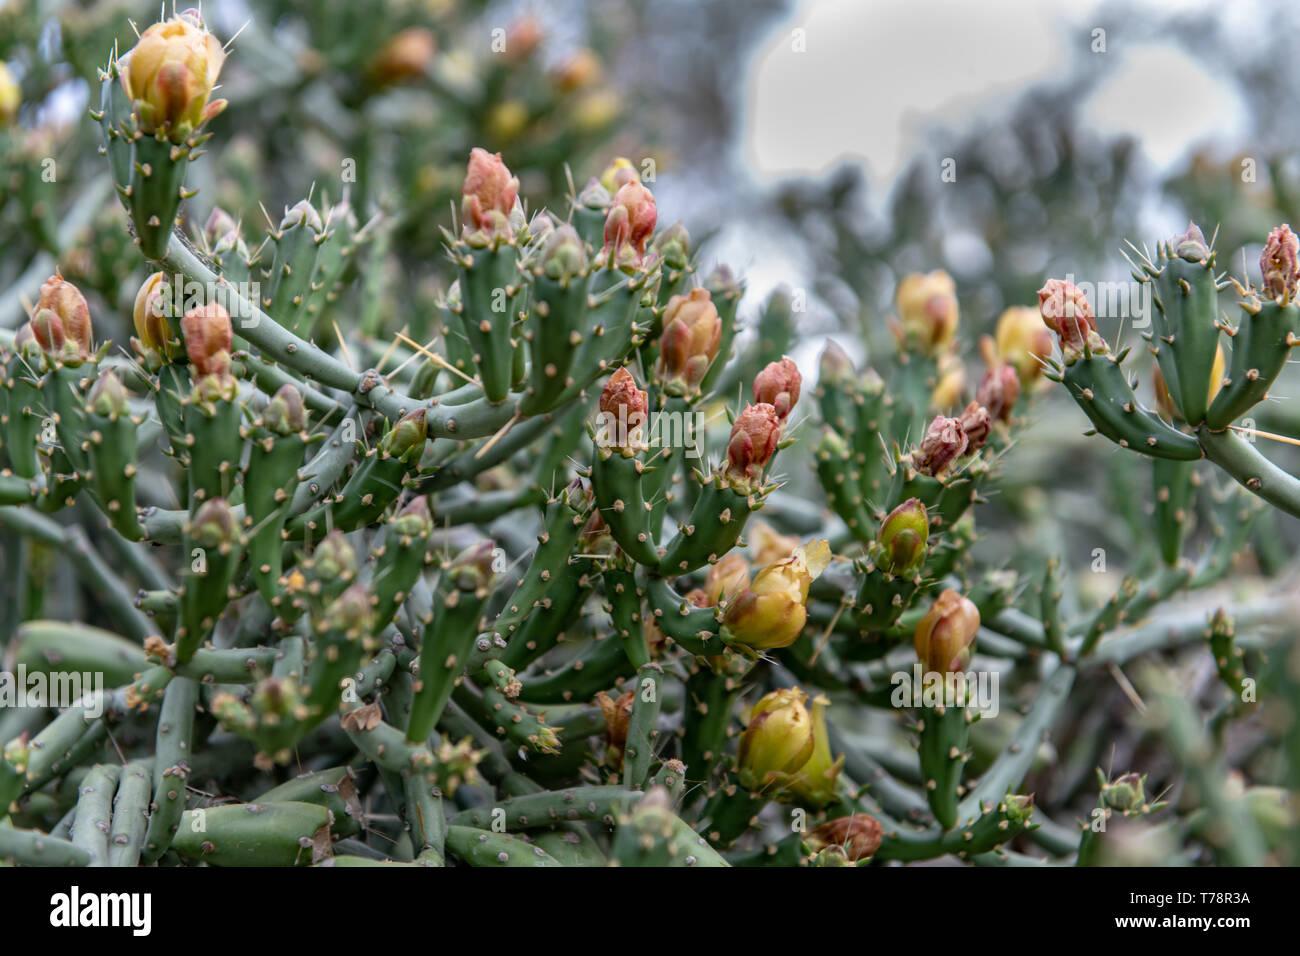 Pencil Cholla (Cylindropuntia ramosissima) in Tucson, Arizona, USA - Stock Image